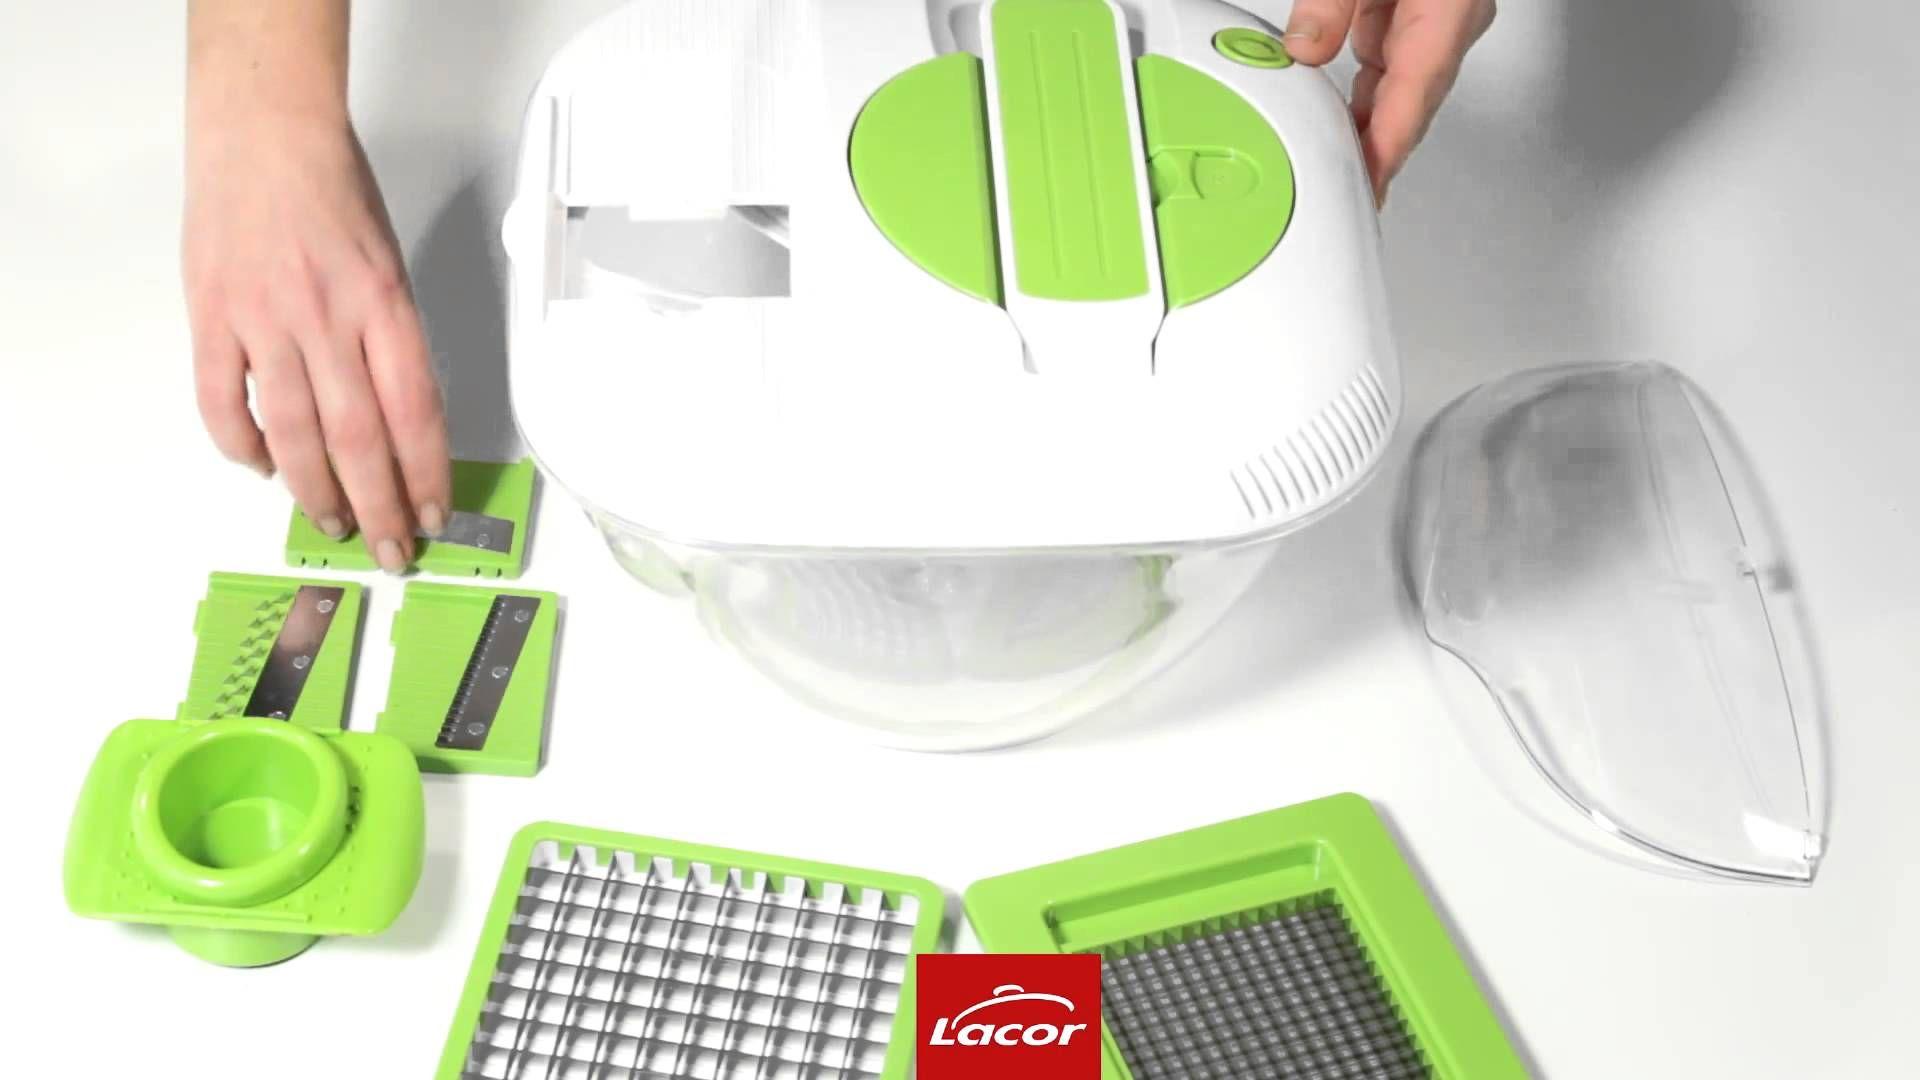 Mandolina de cocina centrifugadora de verduras cortador for Mandolina utensilio de cocina